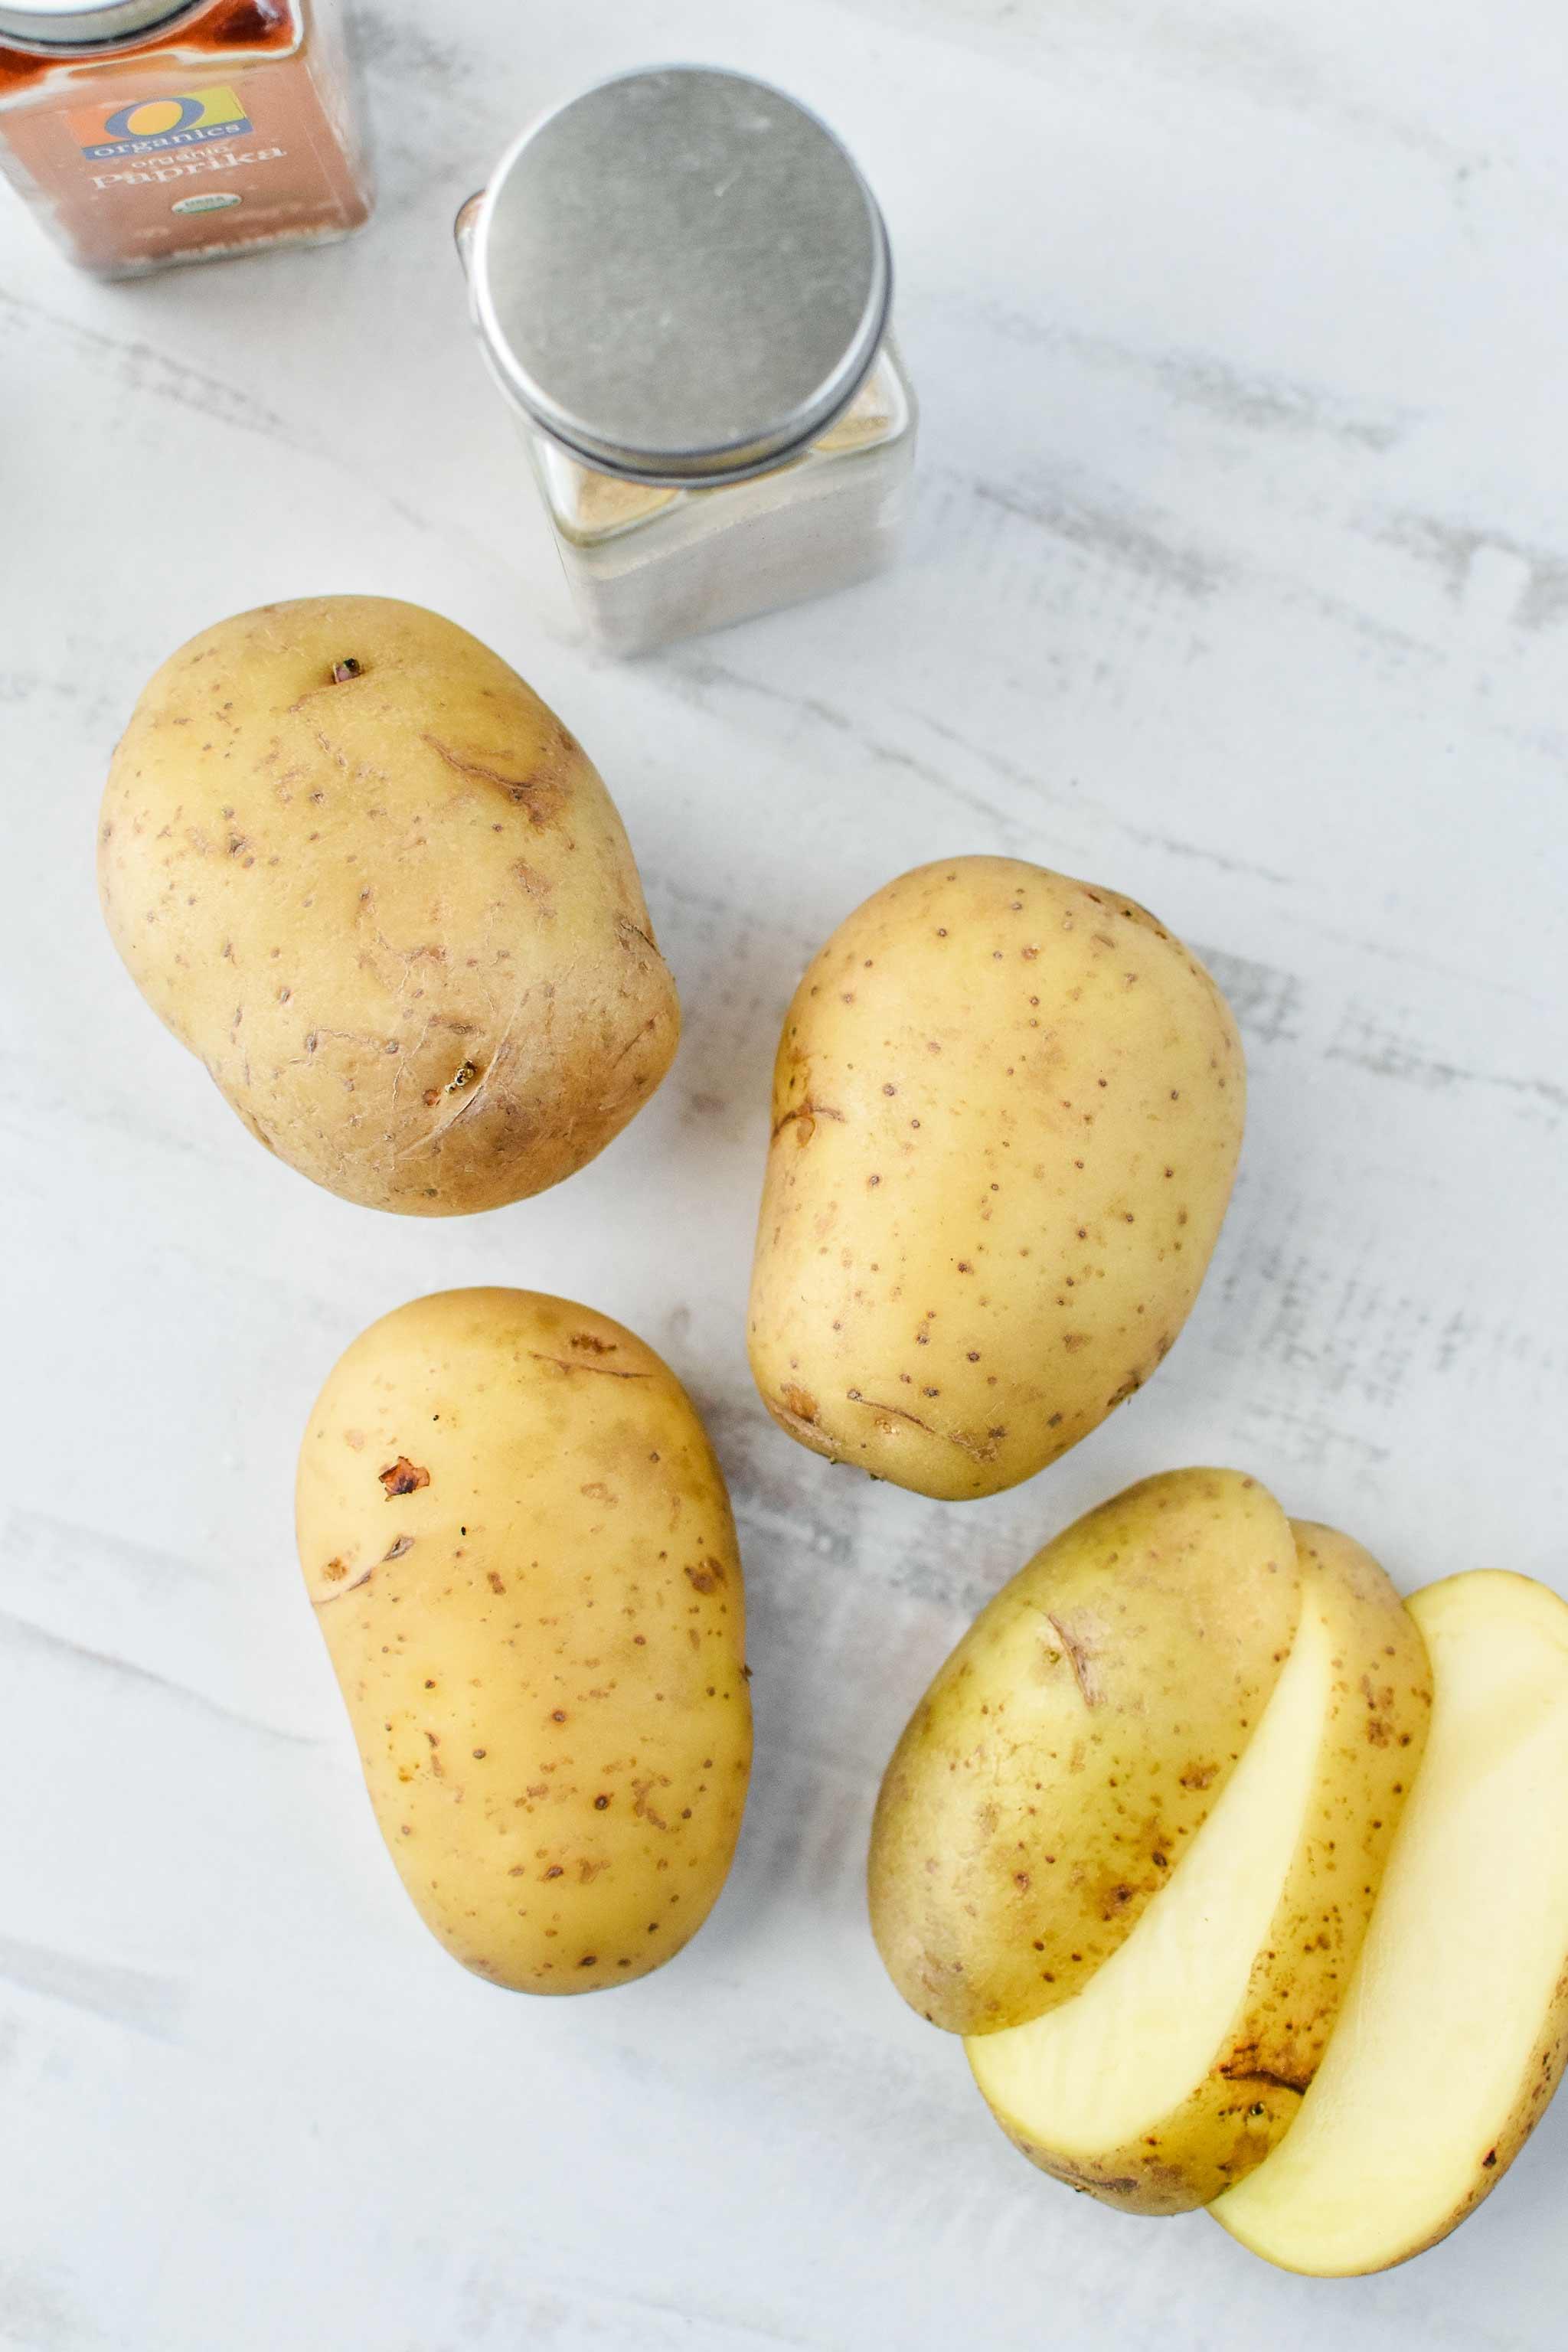 gold yukon potatoes for the basic oven breakfast potatoes